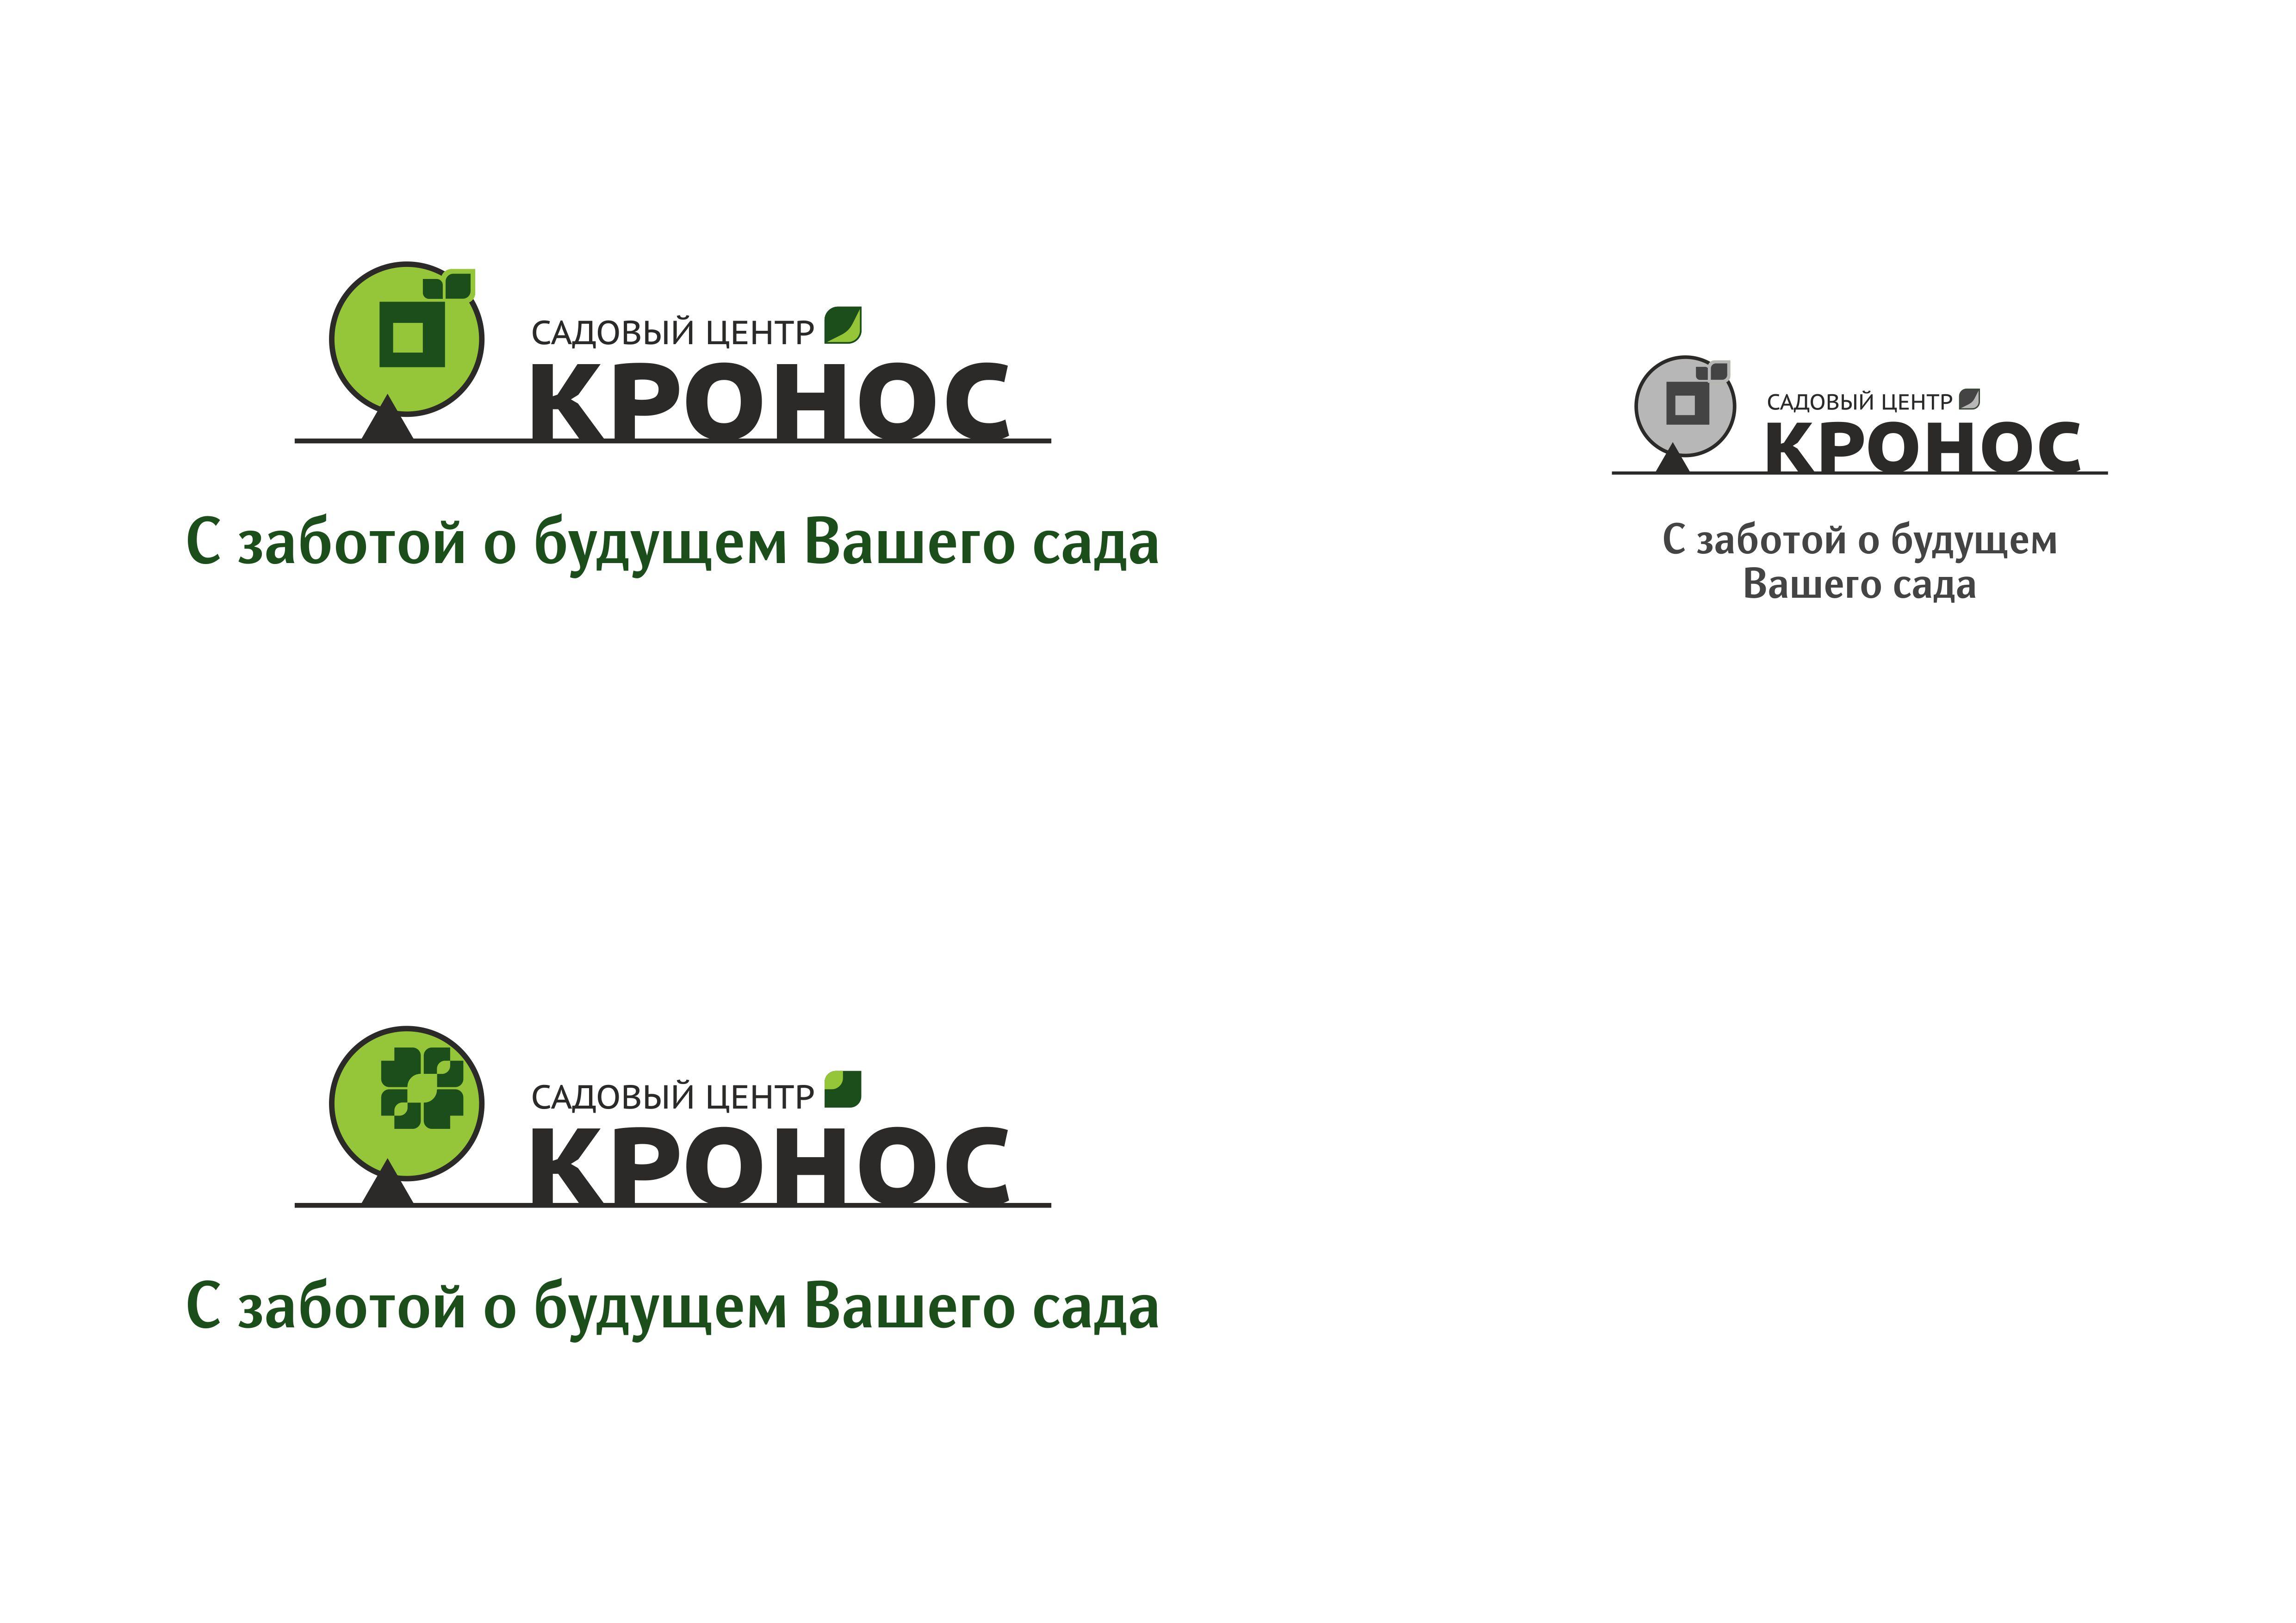 Разработка название садового центра, логотип и слоган фото f_1995a71bd1250c59.jpg